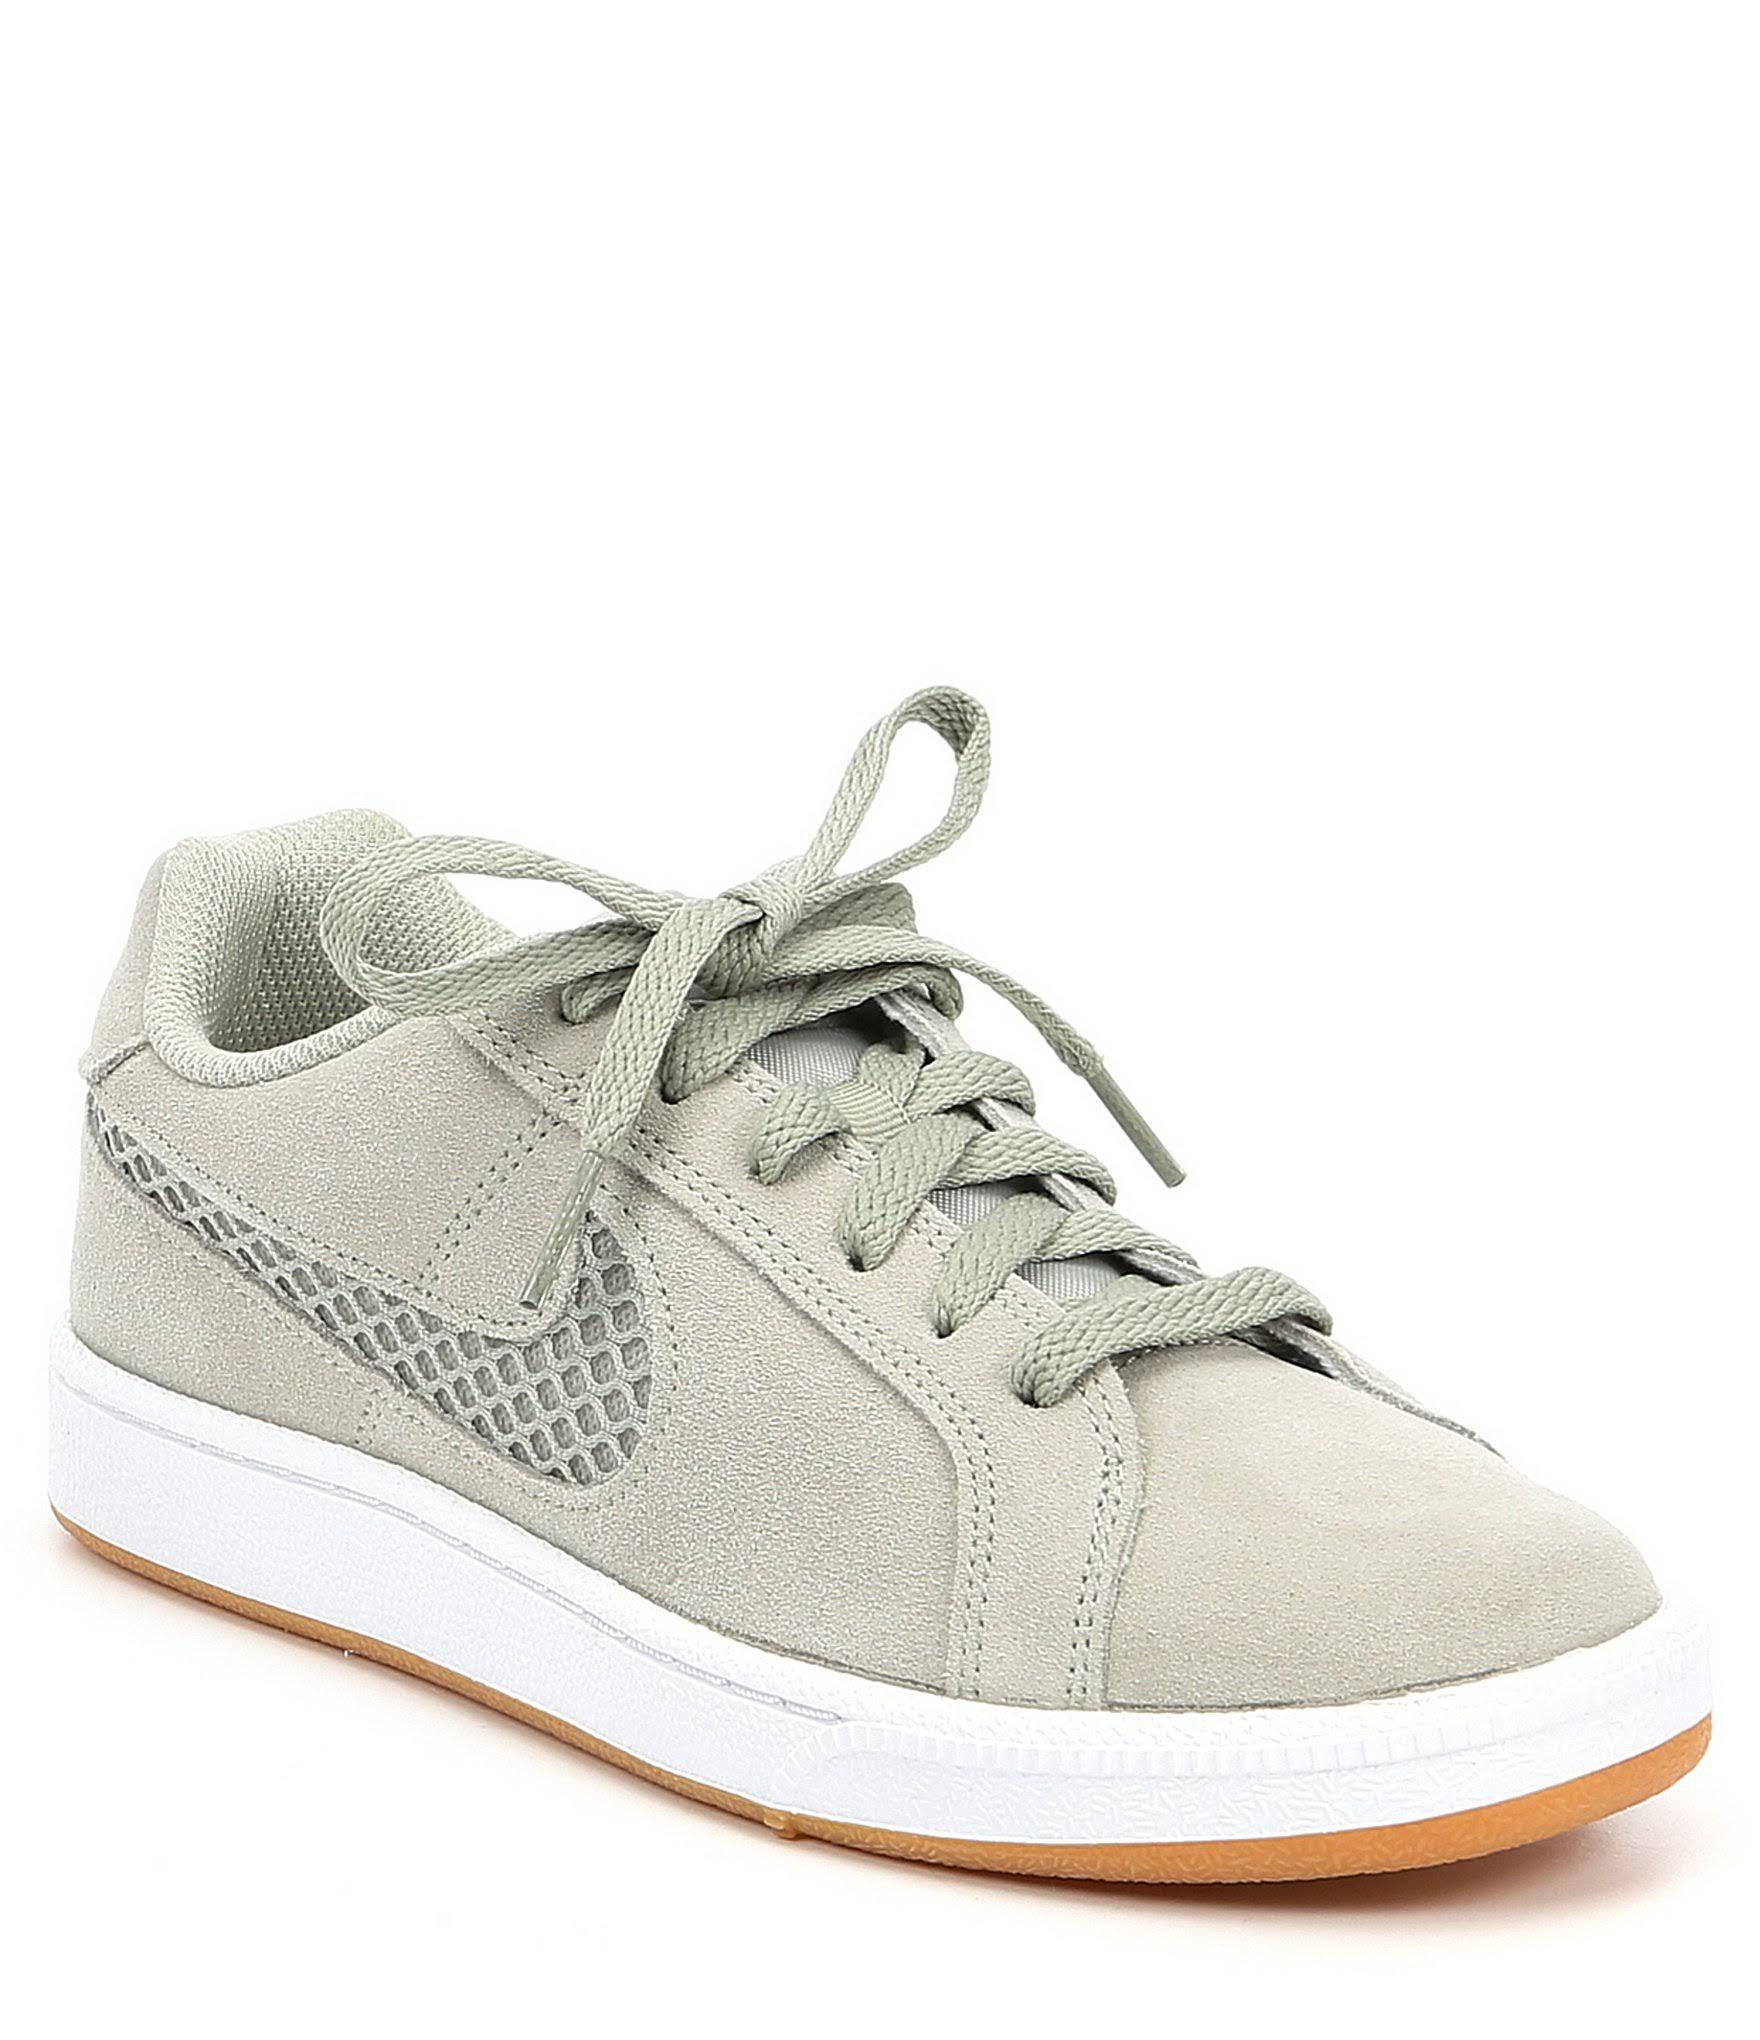 Nike Royale 5 Court Premium Us sQCthrd